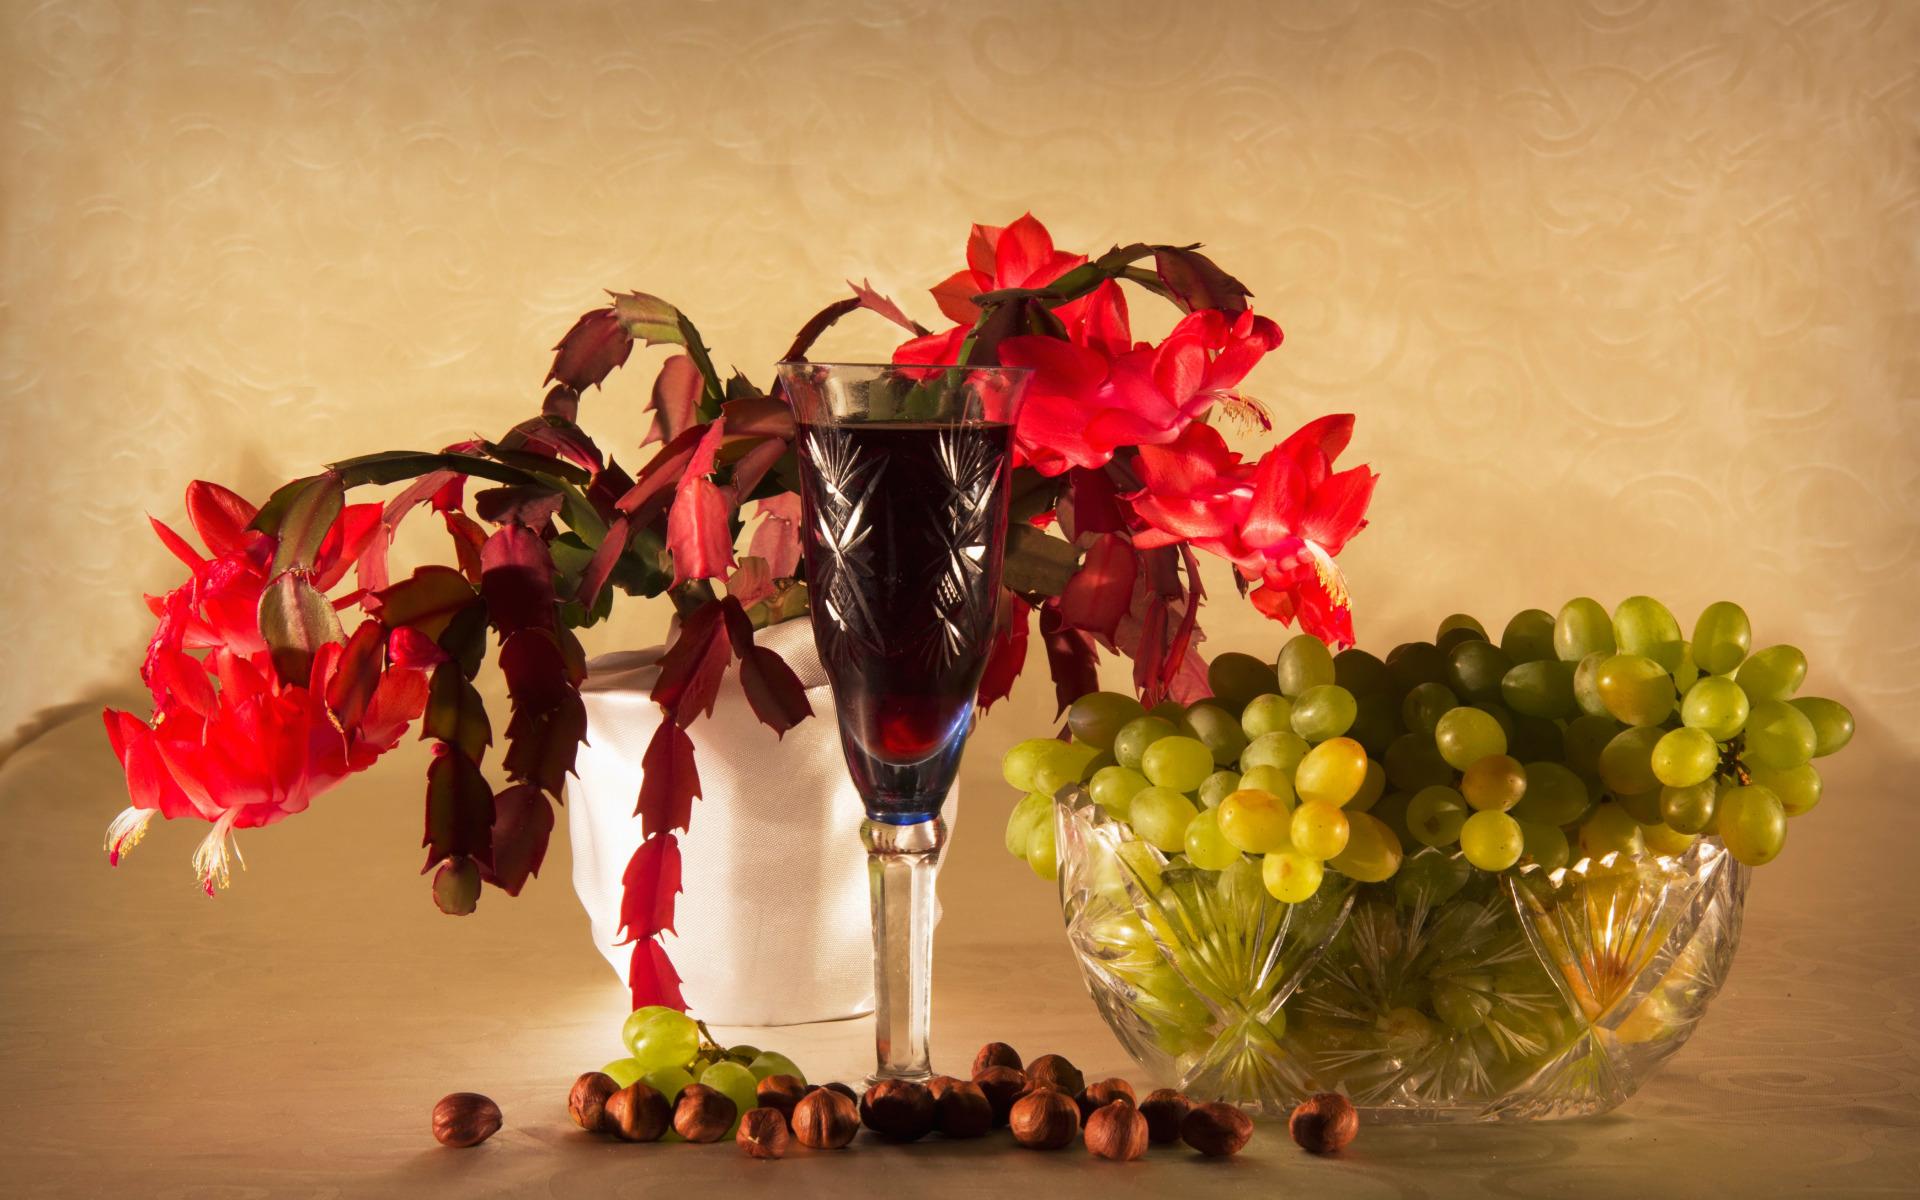 виноград на столе в вазе фото темно-коричневой мастики лепешку